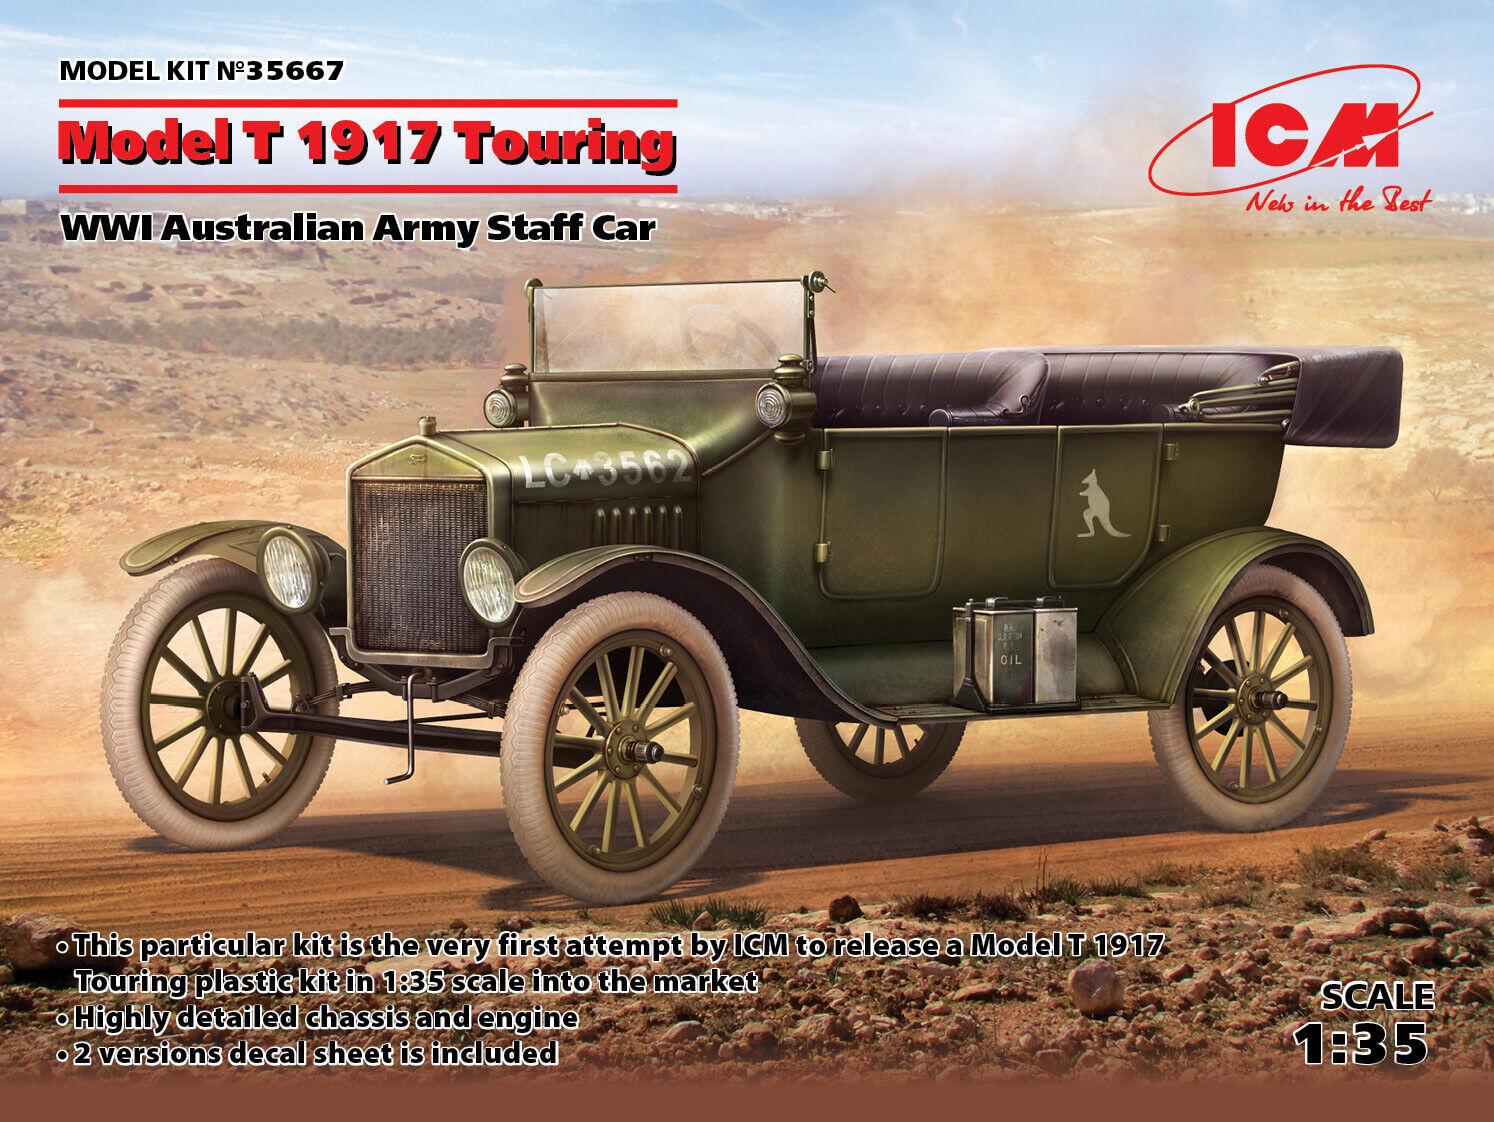 Icm 1 1 1 35 Modello T 1917 Touring WWI Australiane Esercito Bastone Auto 81daa7